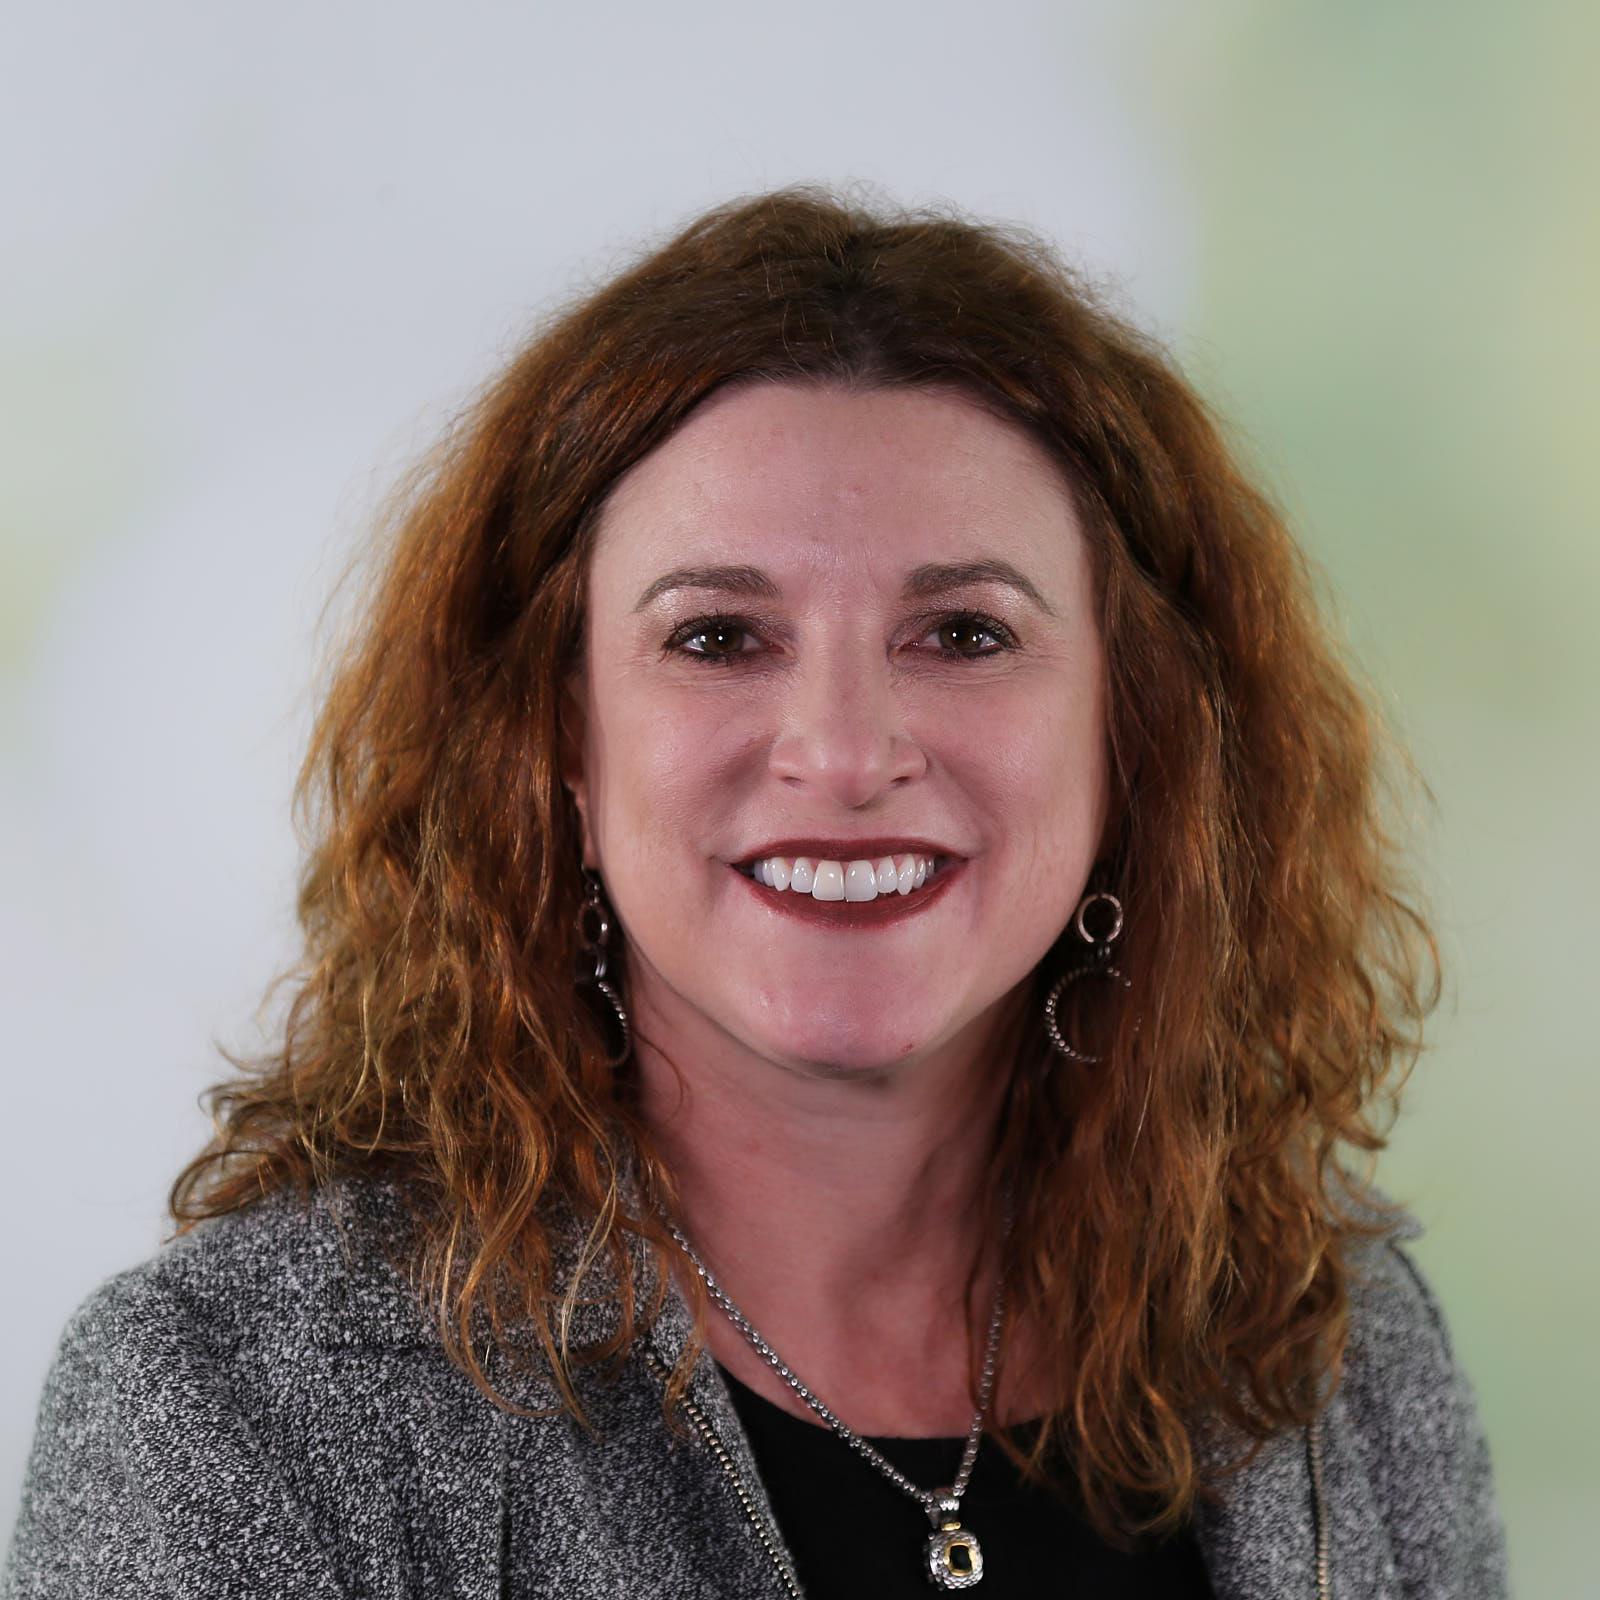 Paige Goff on consumer behavior